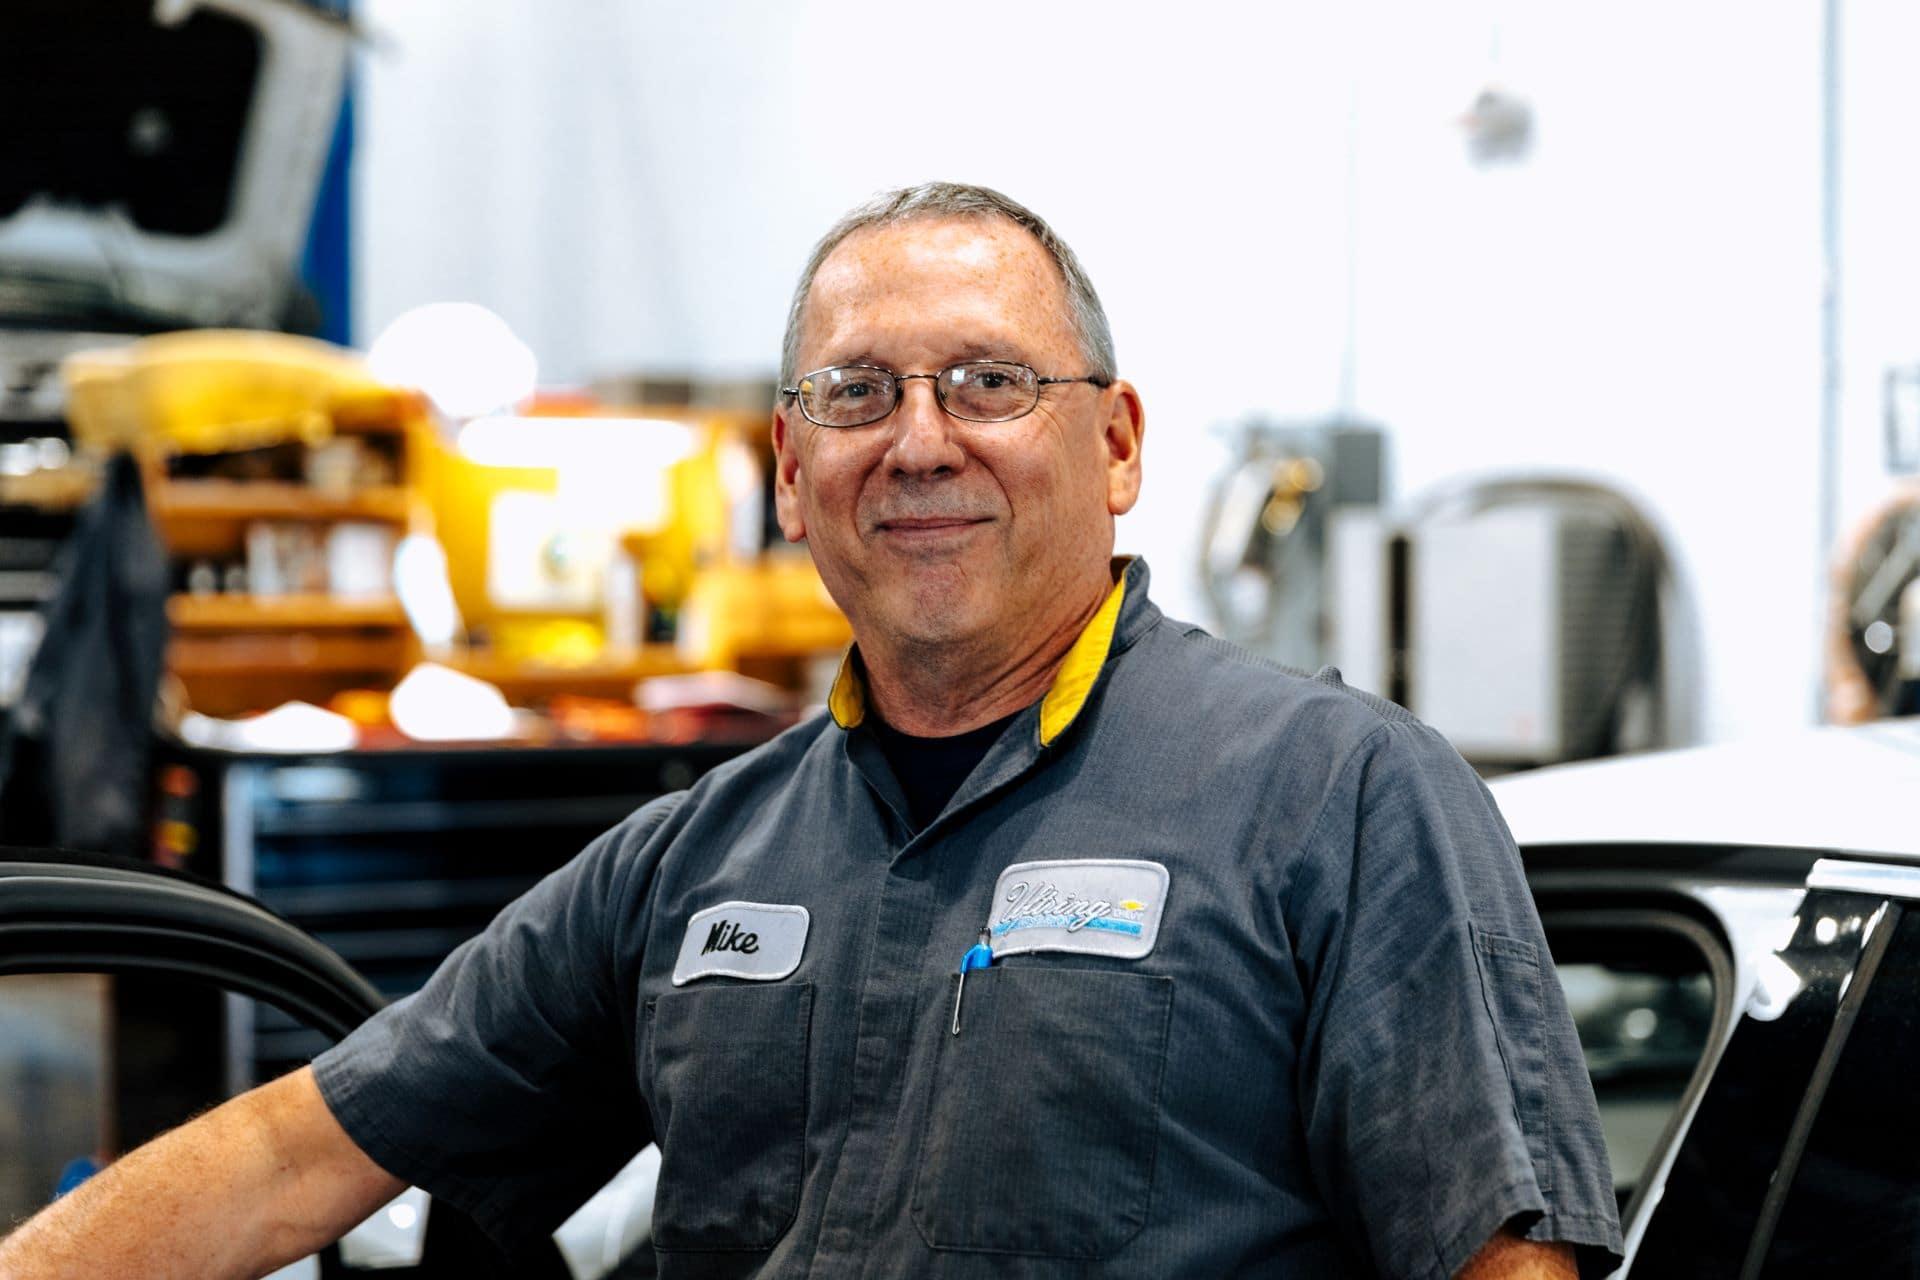 Service technician doing an oil change